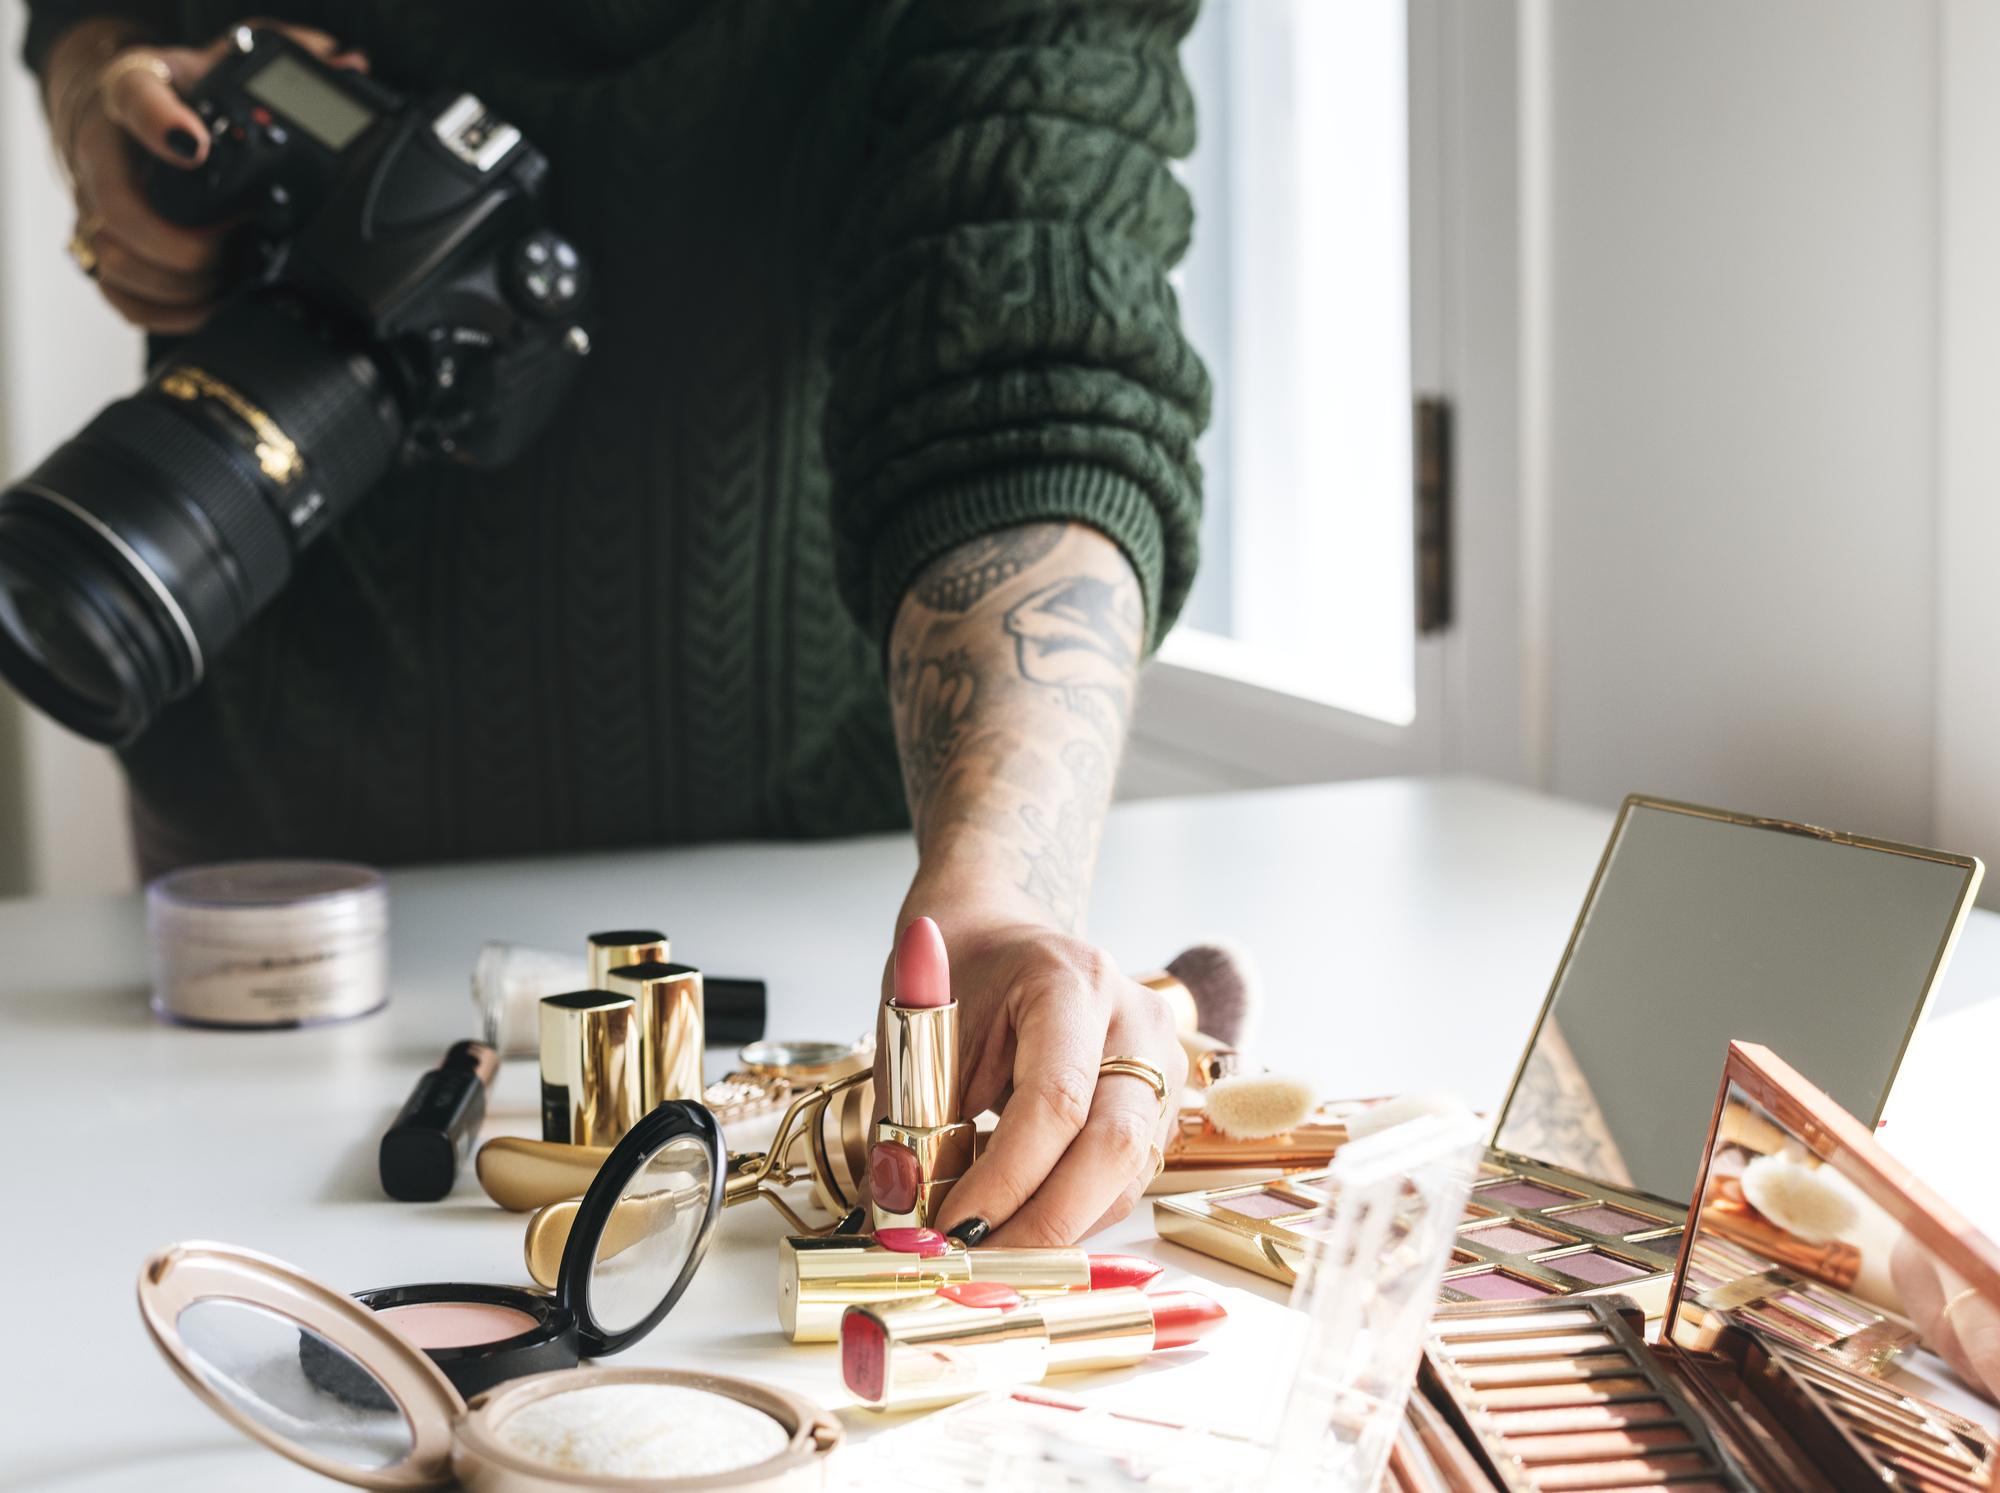 macro photography beauty blogger taking photo of cosmetics